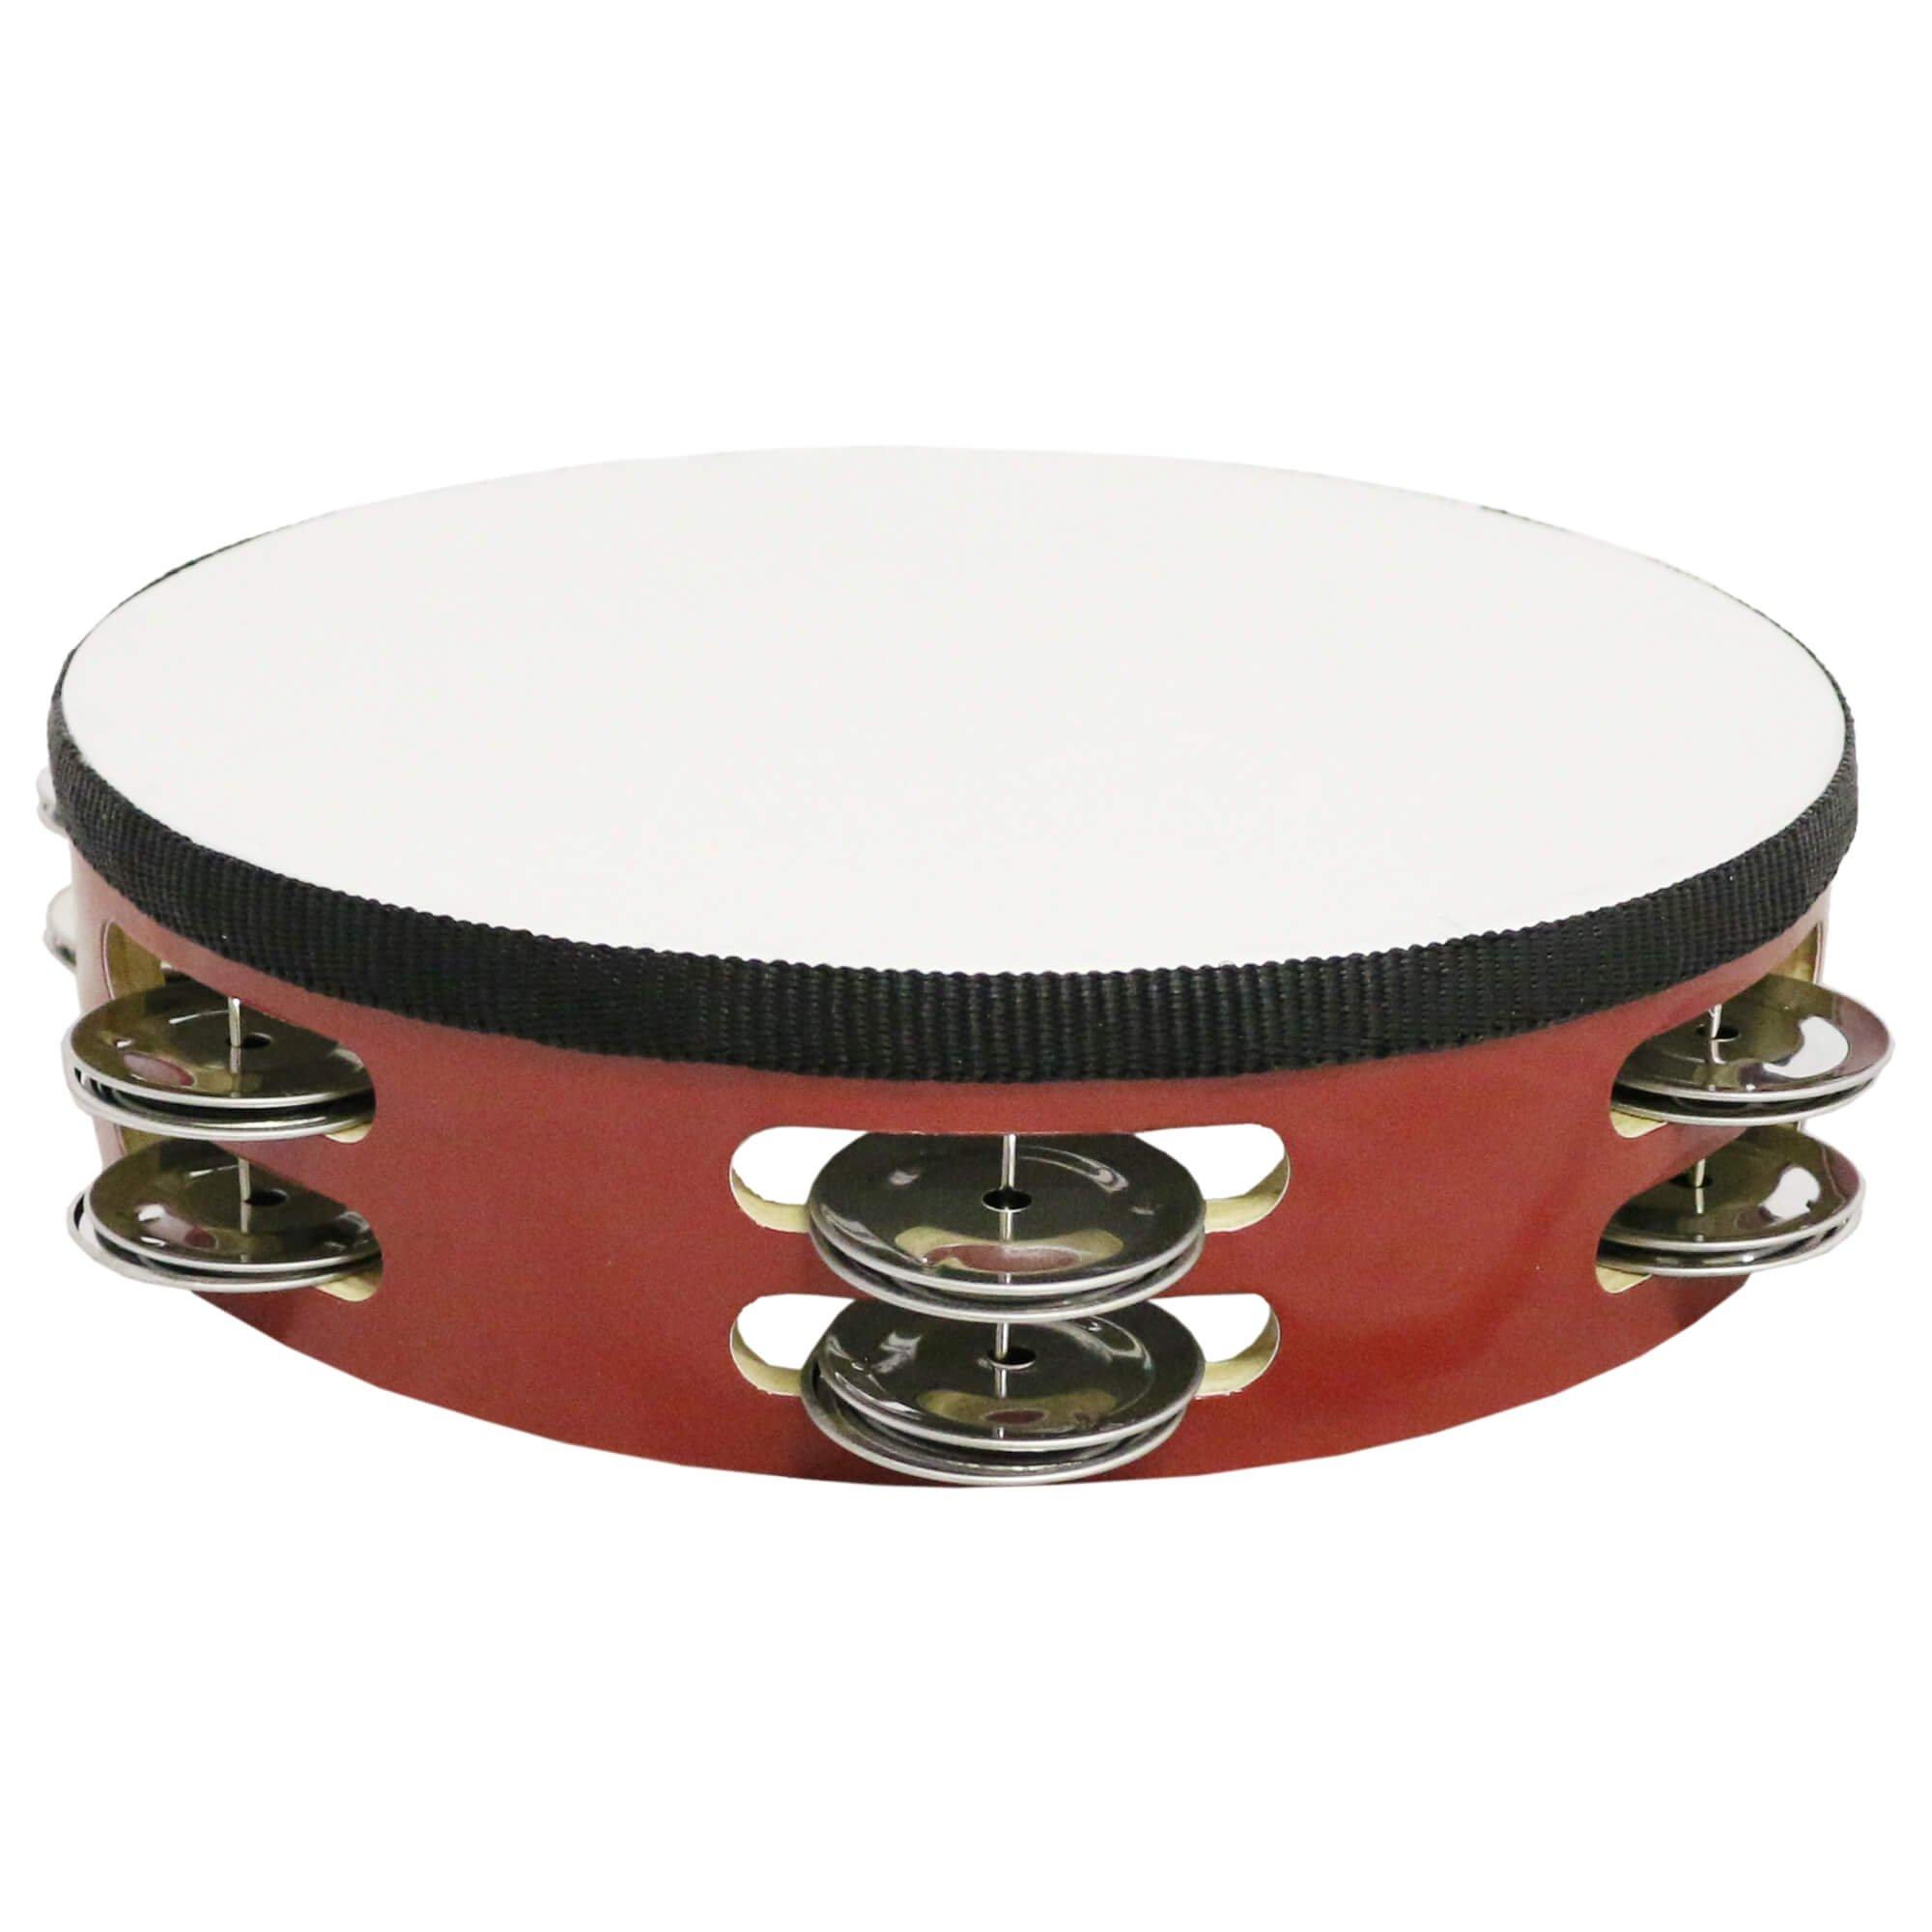 Danzcue 8 Silver/red Double Rows Jingles Tambourine